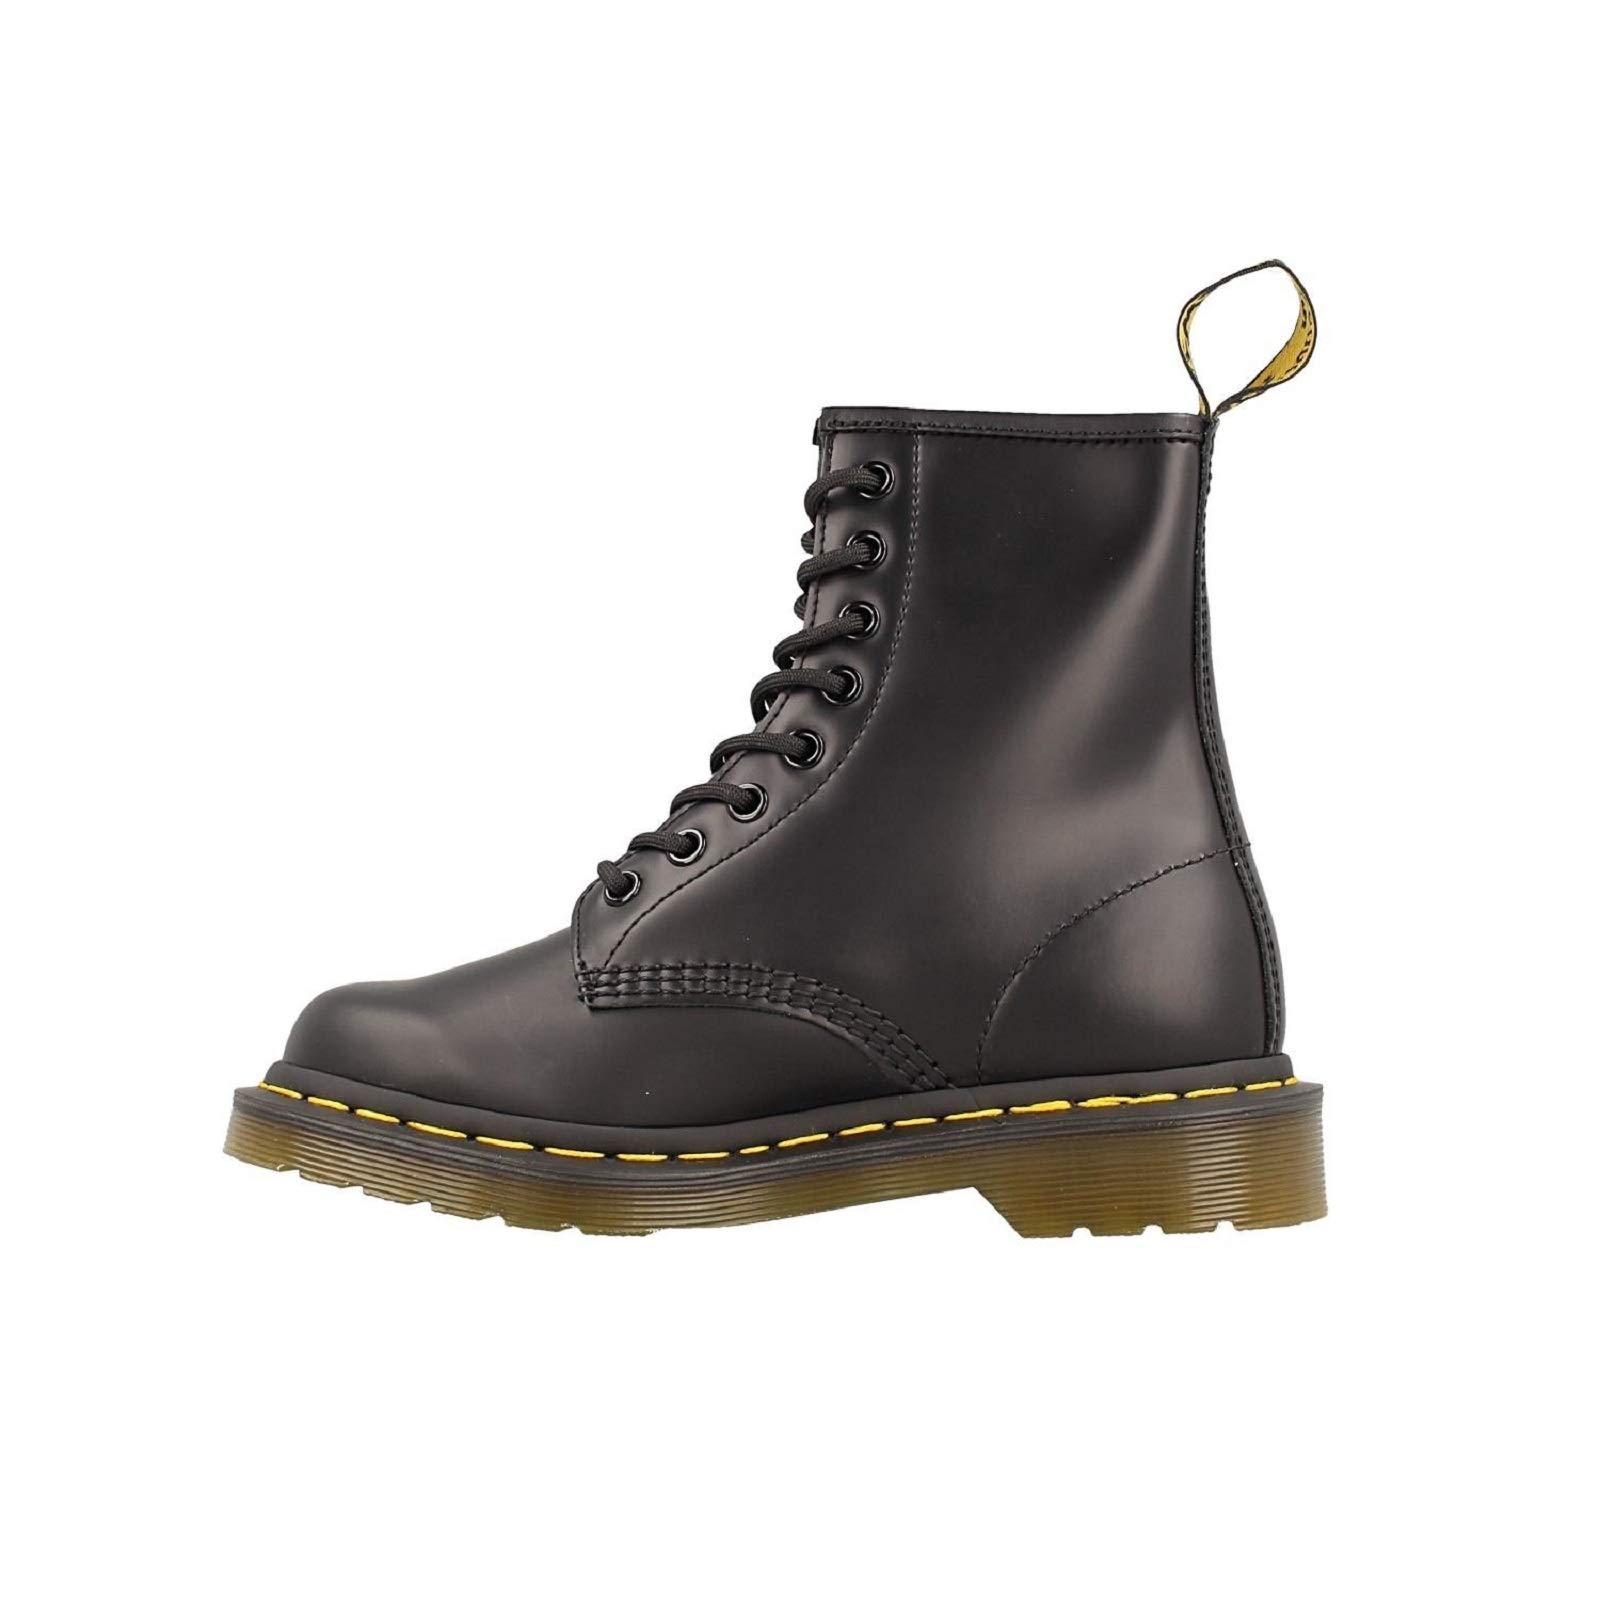 49972b5c3f0660 Dr. Martens 1460 Originals 8 Eye Lace Up Boot